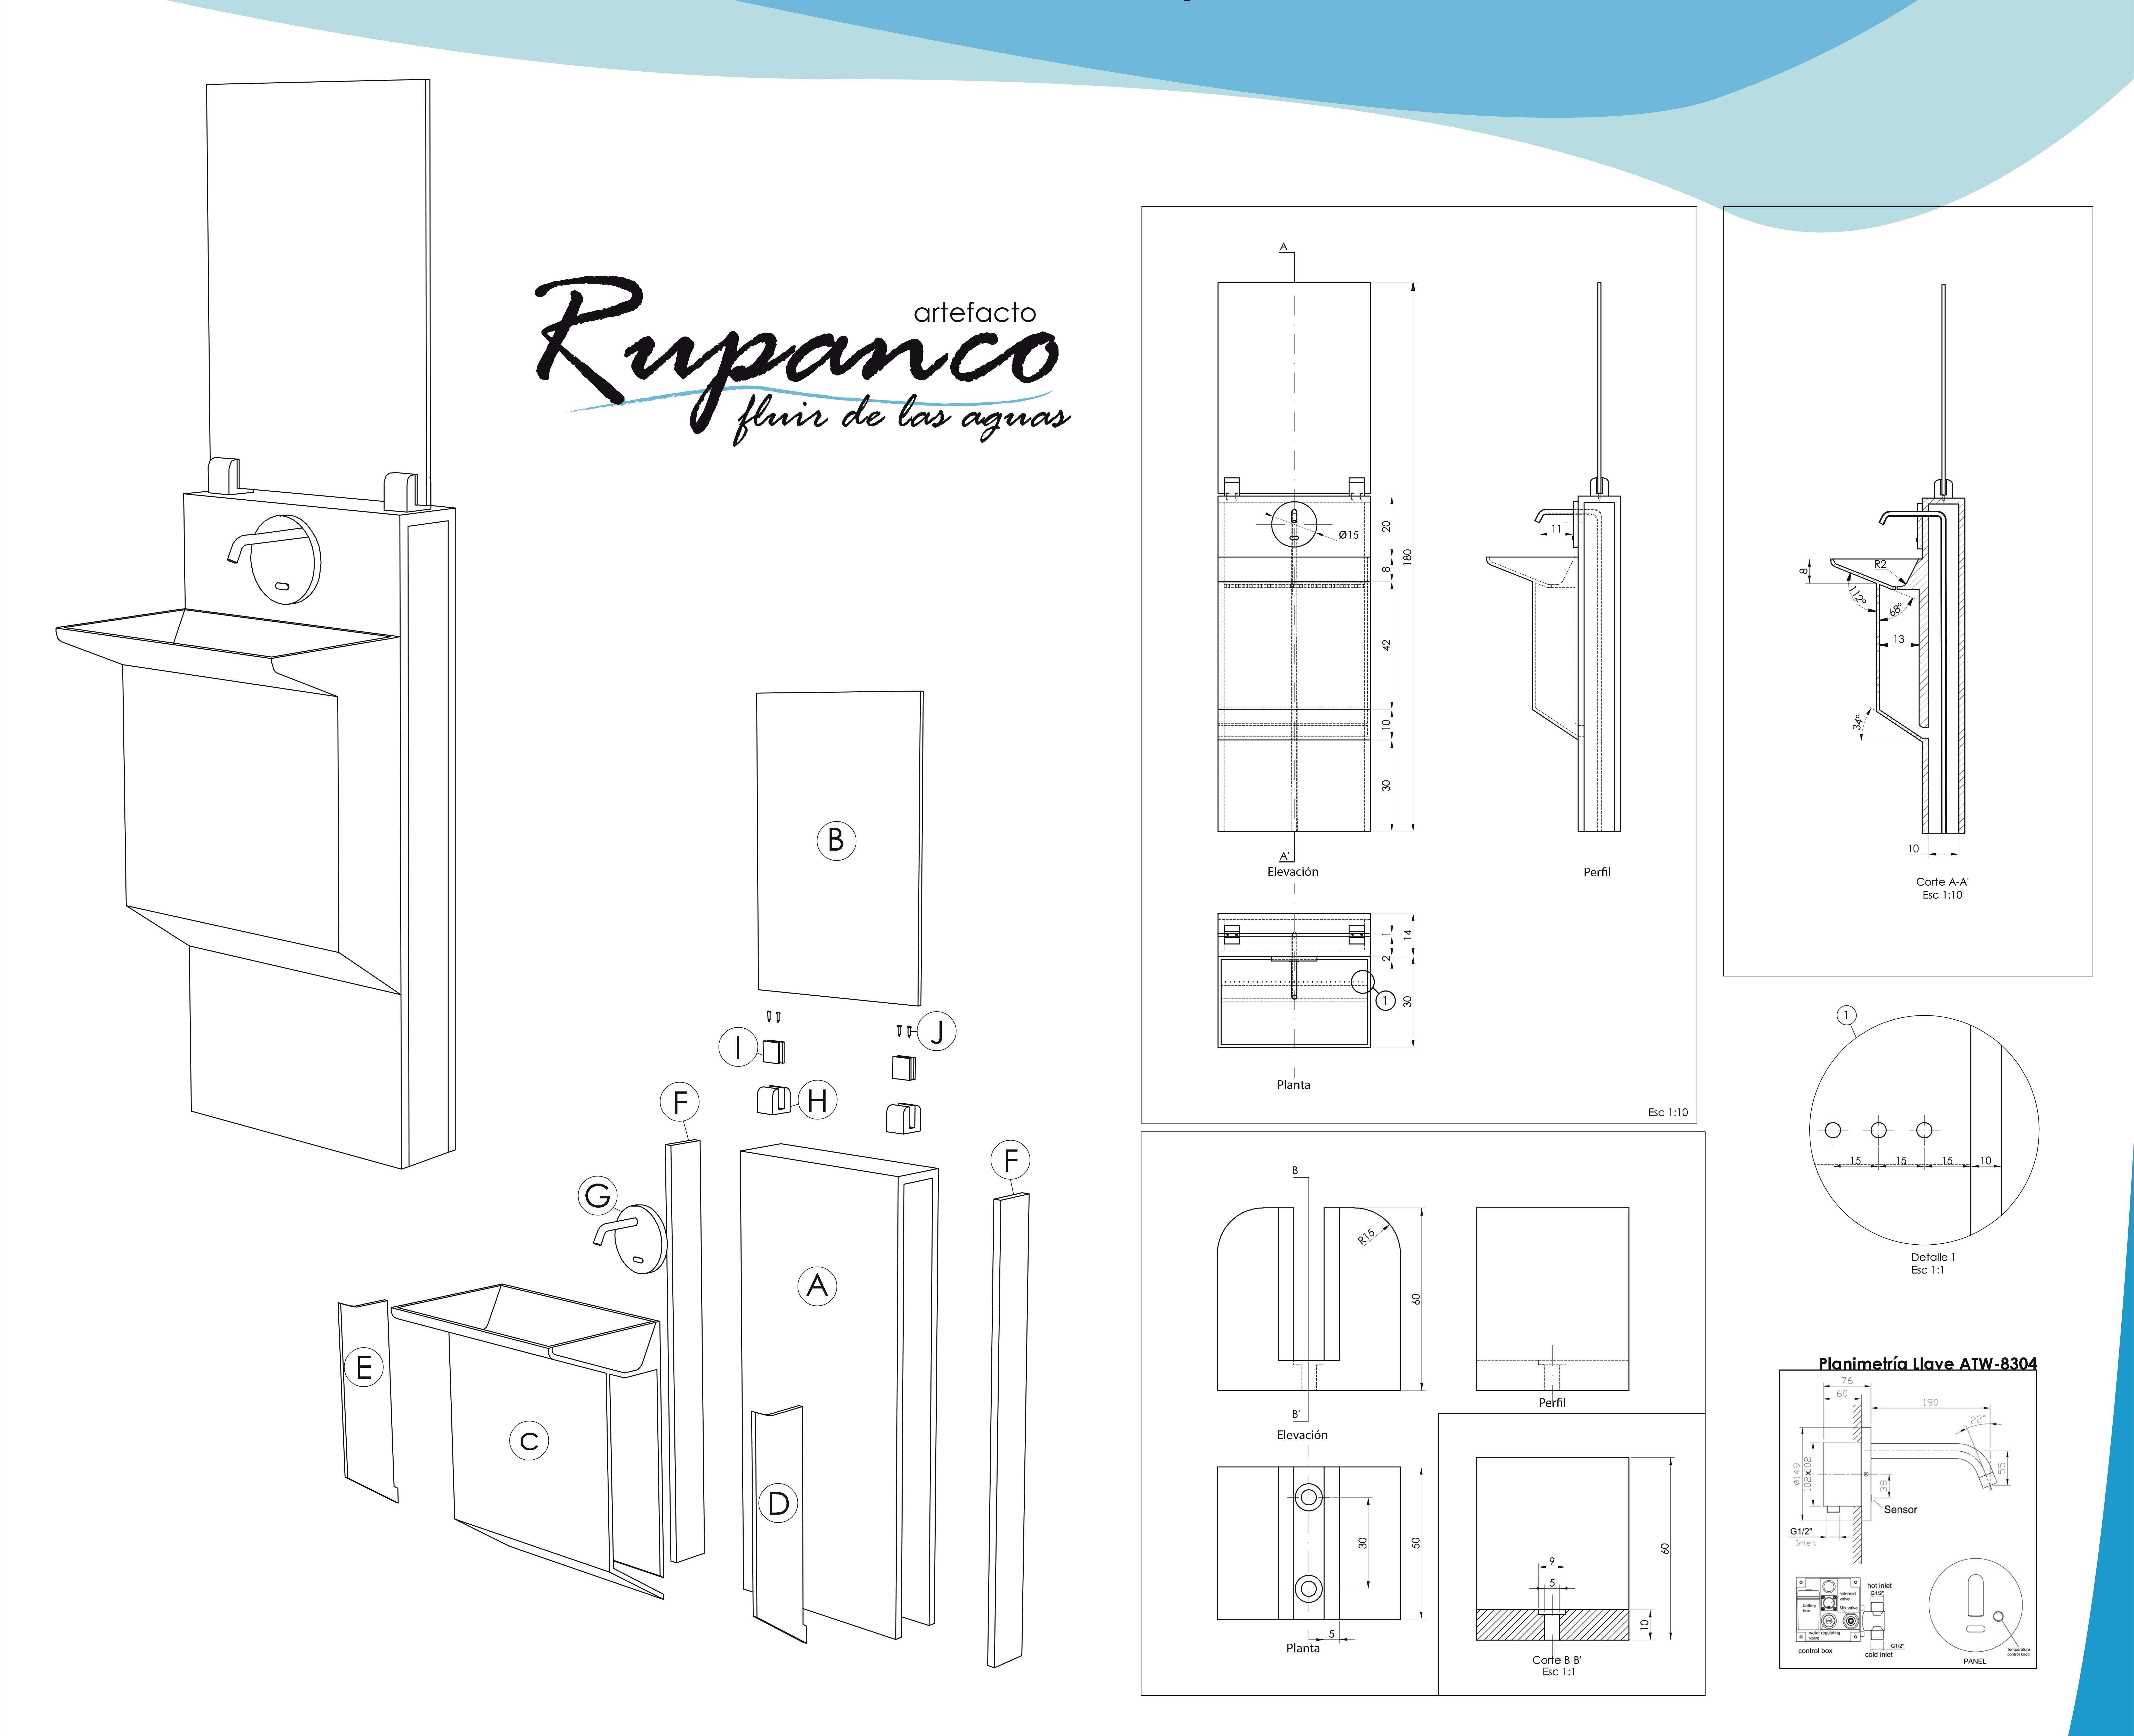 Rupanco technical drawings